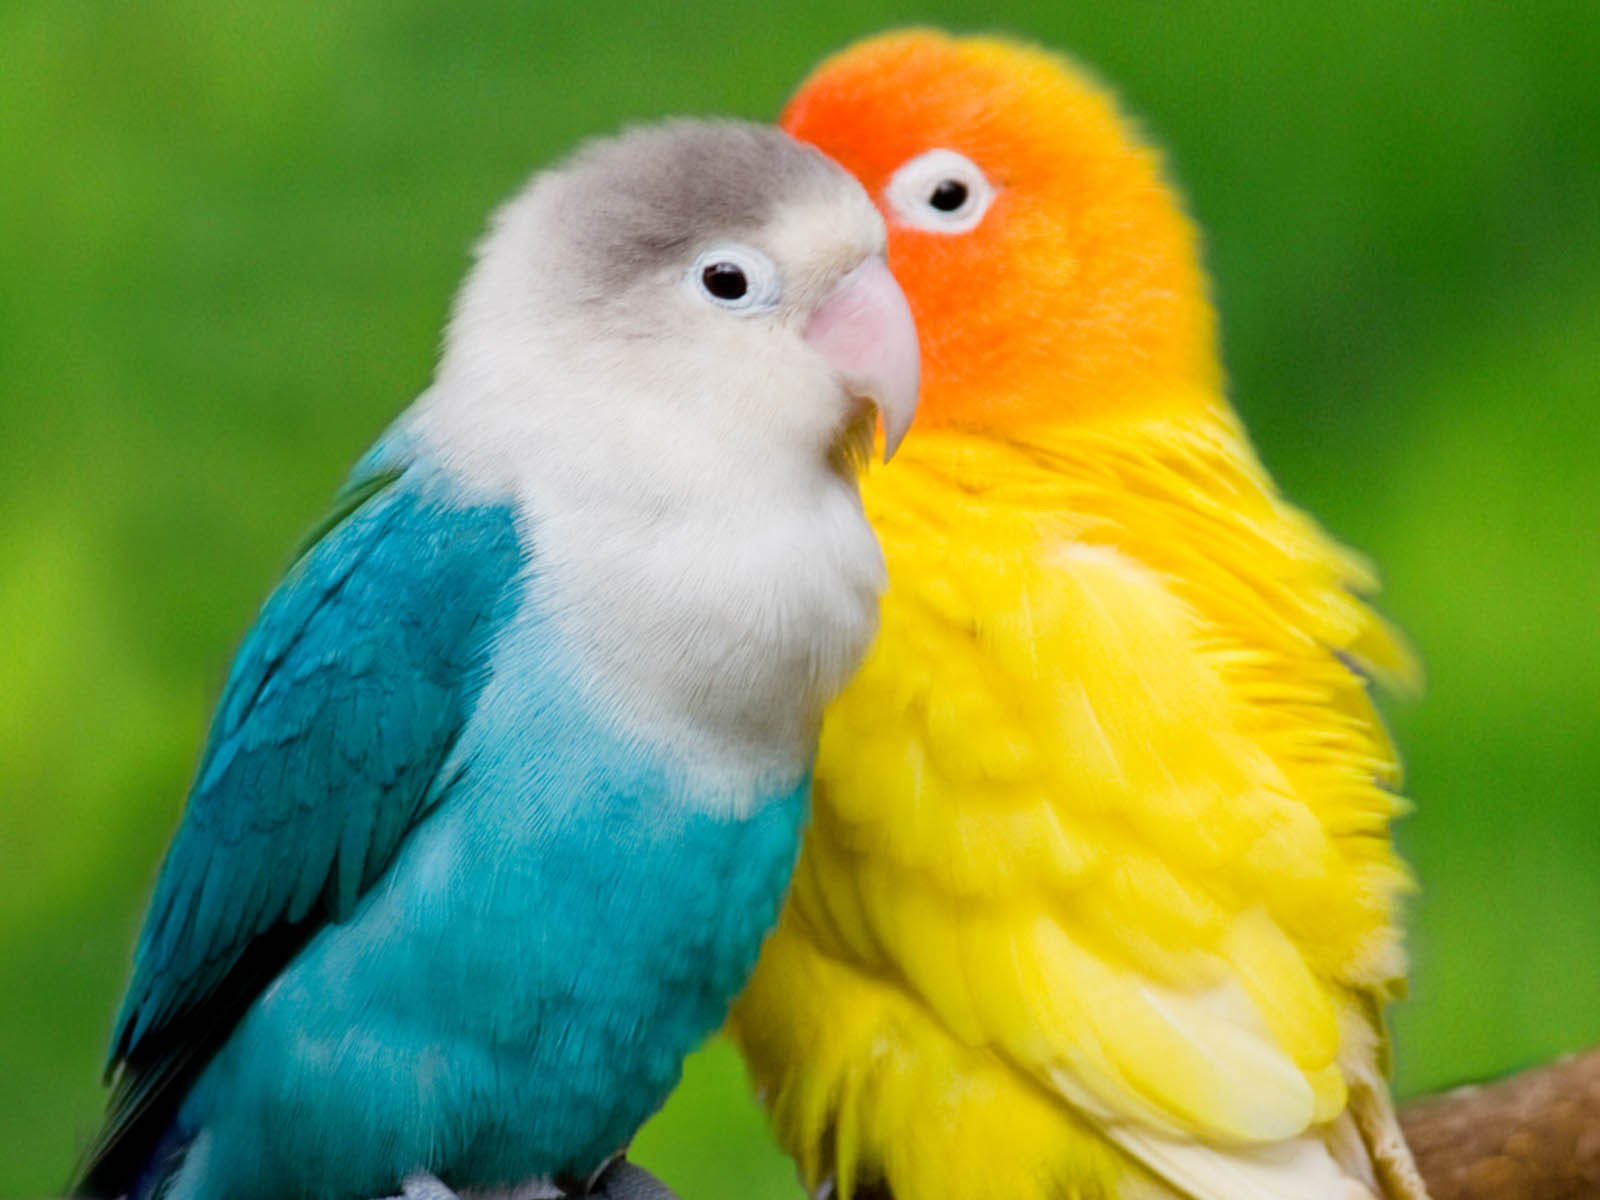 Desktop Wallpapers Colourful Parrots Desktop Wallpapers 1600x1200